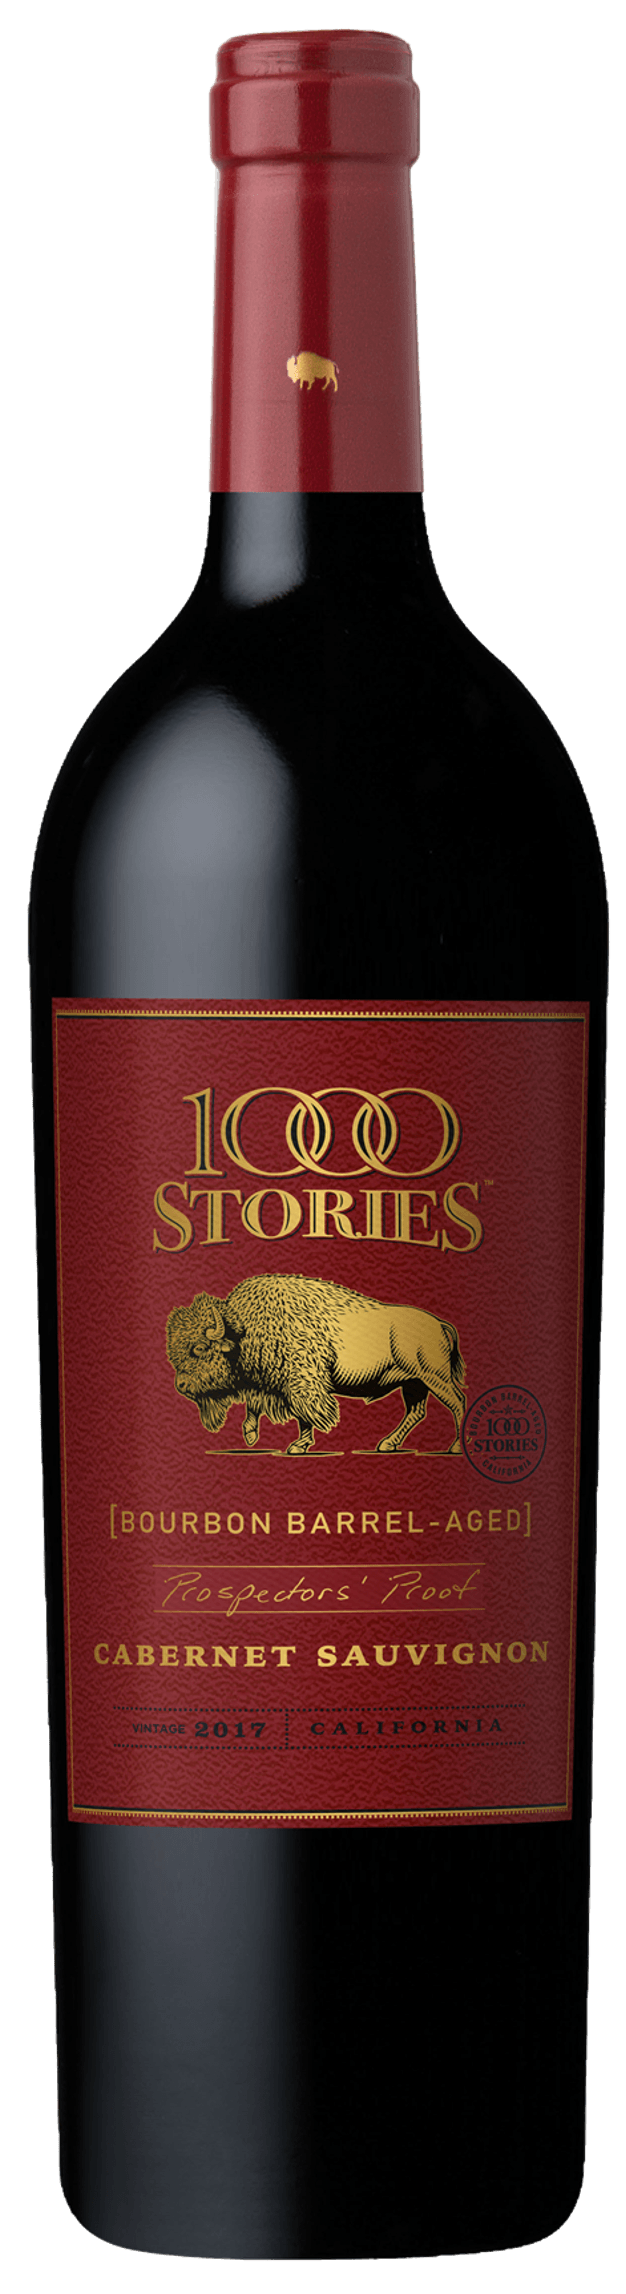 2017 1000 Stories Cabernet Sauvignon 750ml